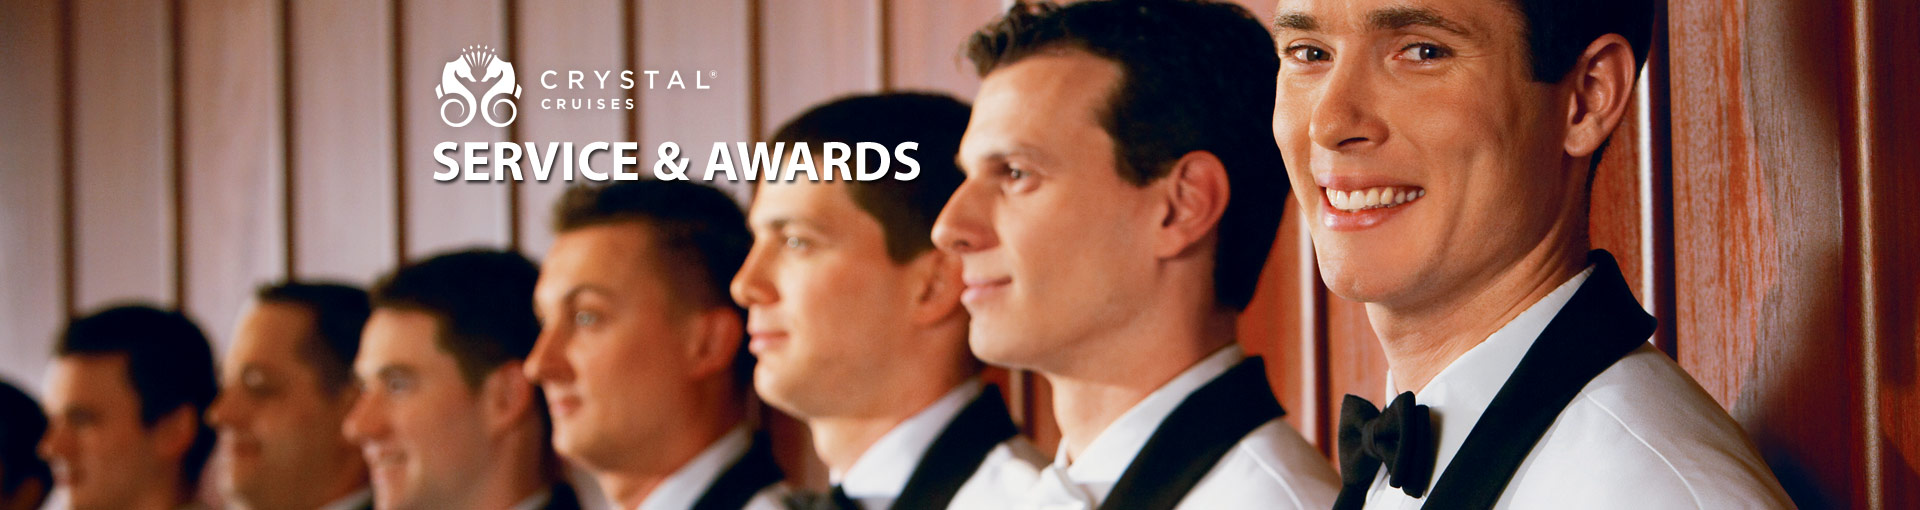 Crystal Cruises Service & Awards